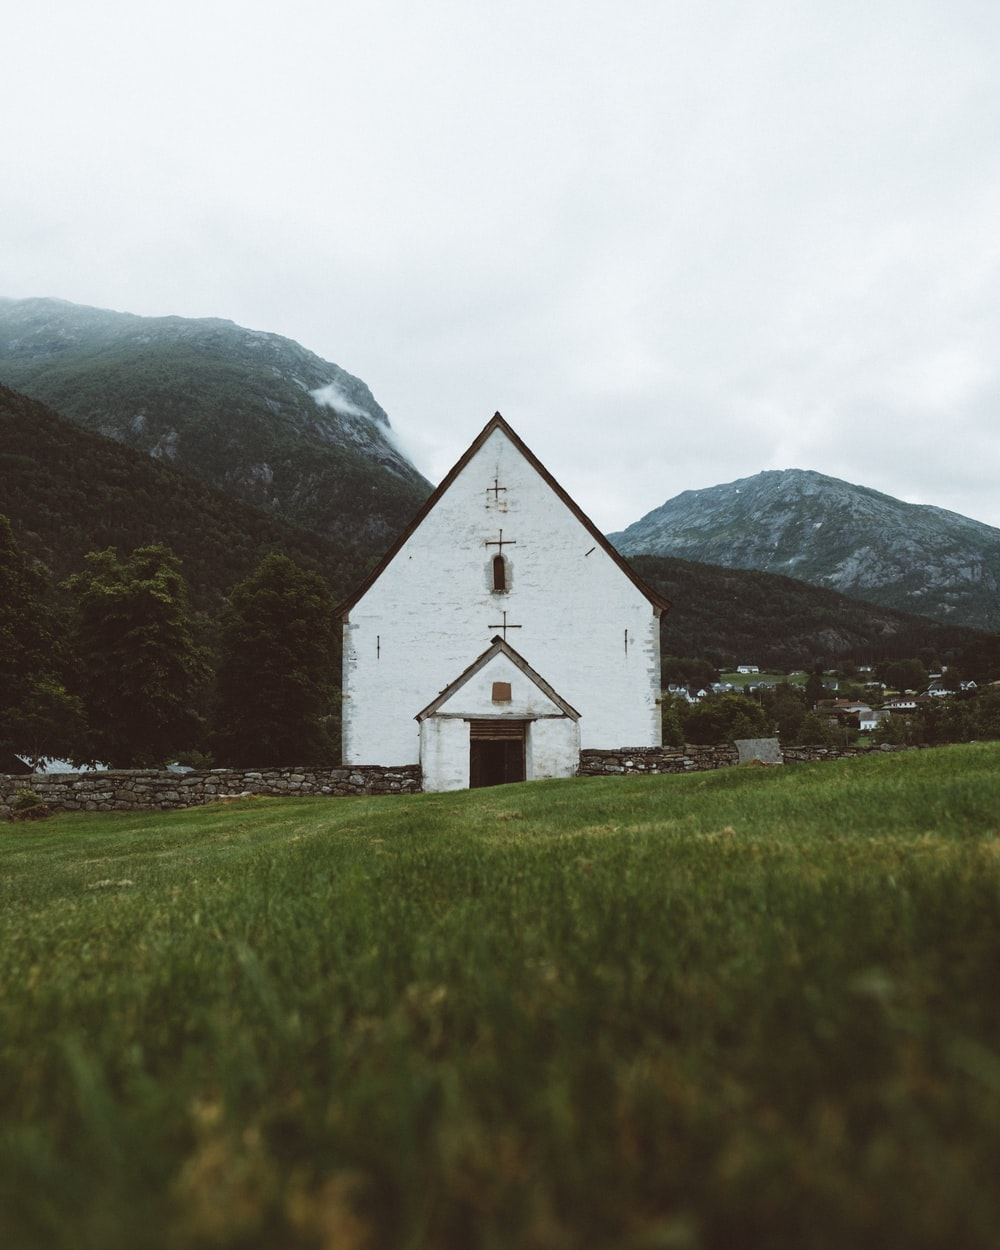 white concrete church near mountain peaks